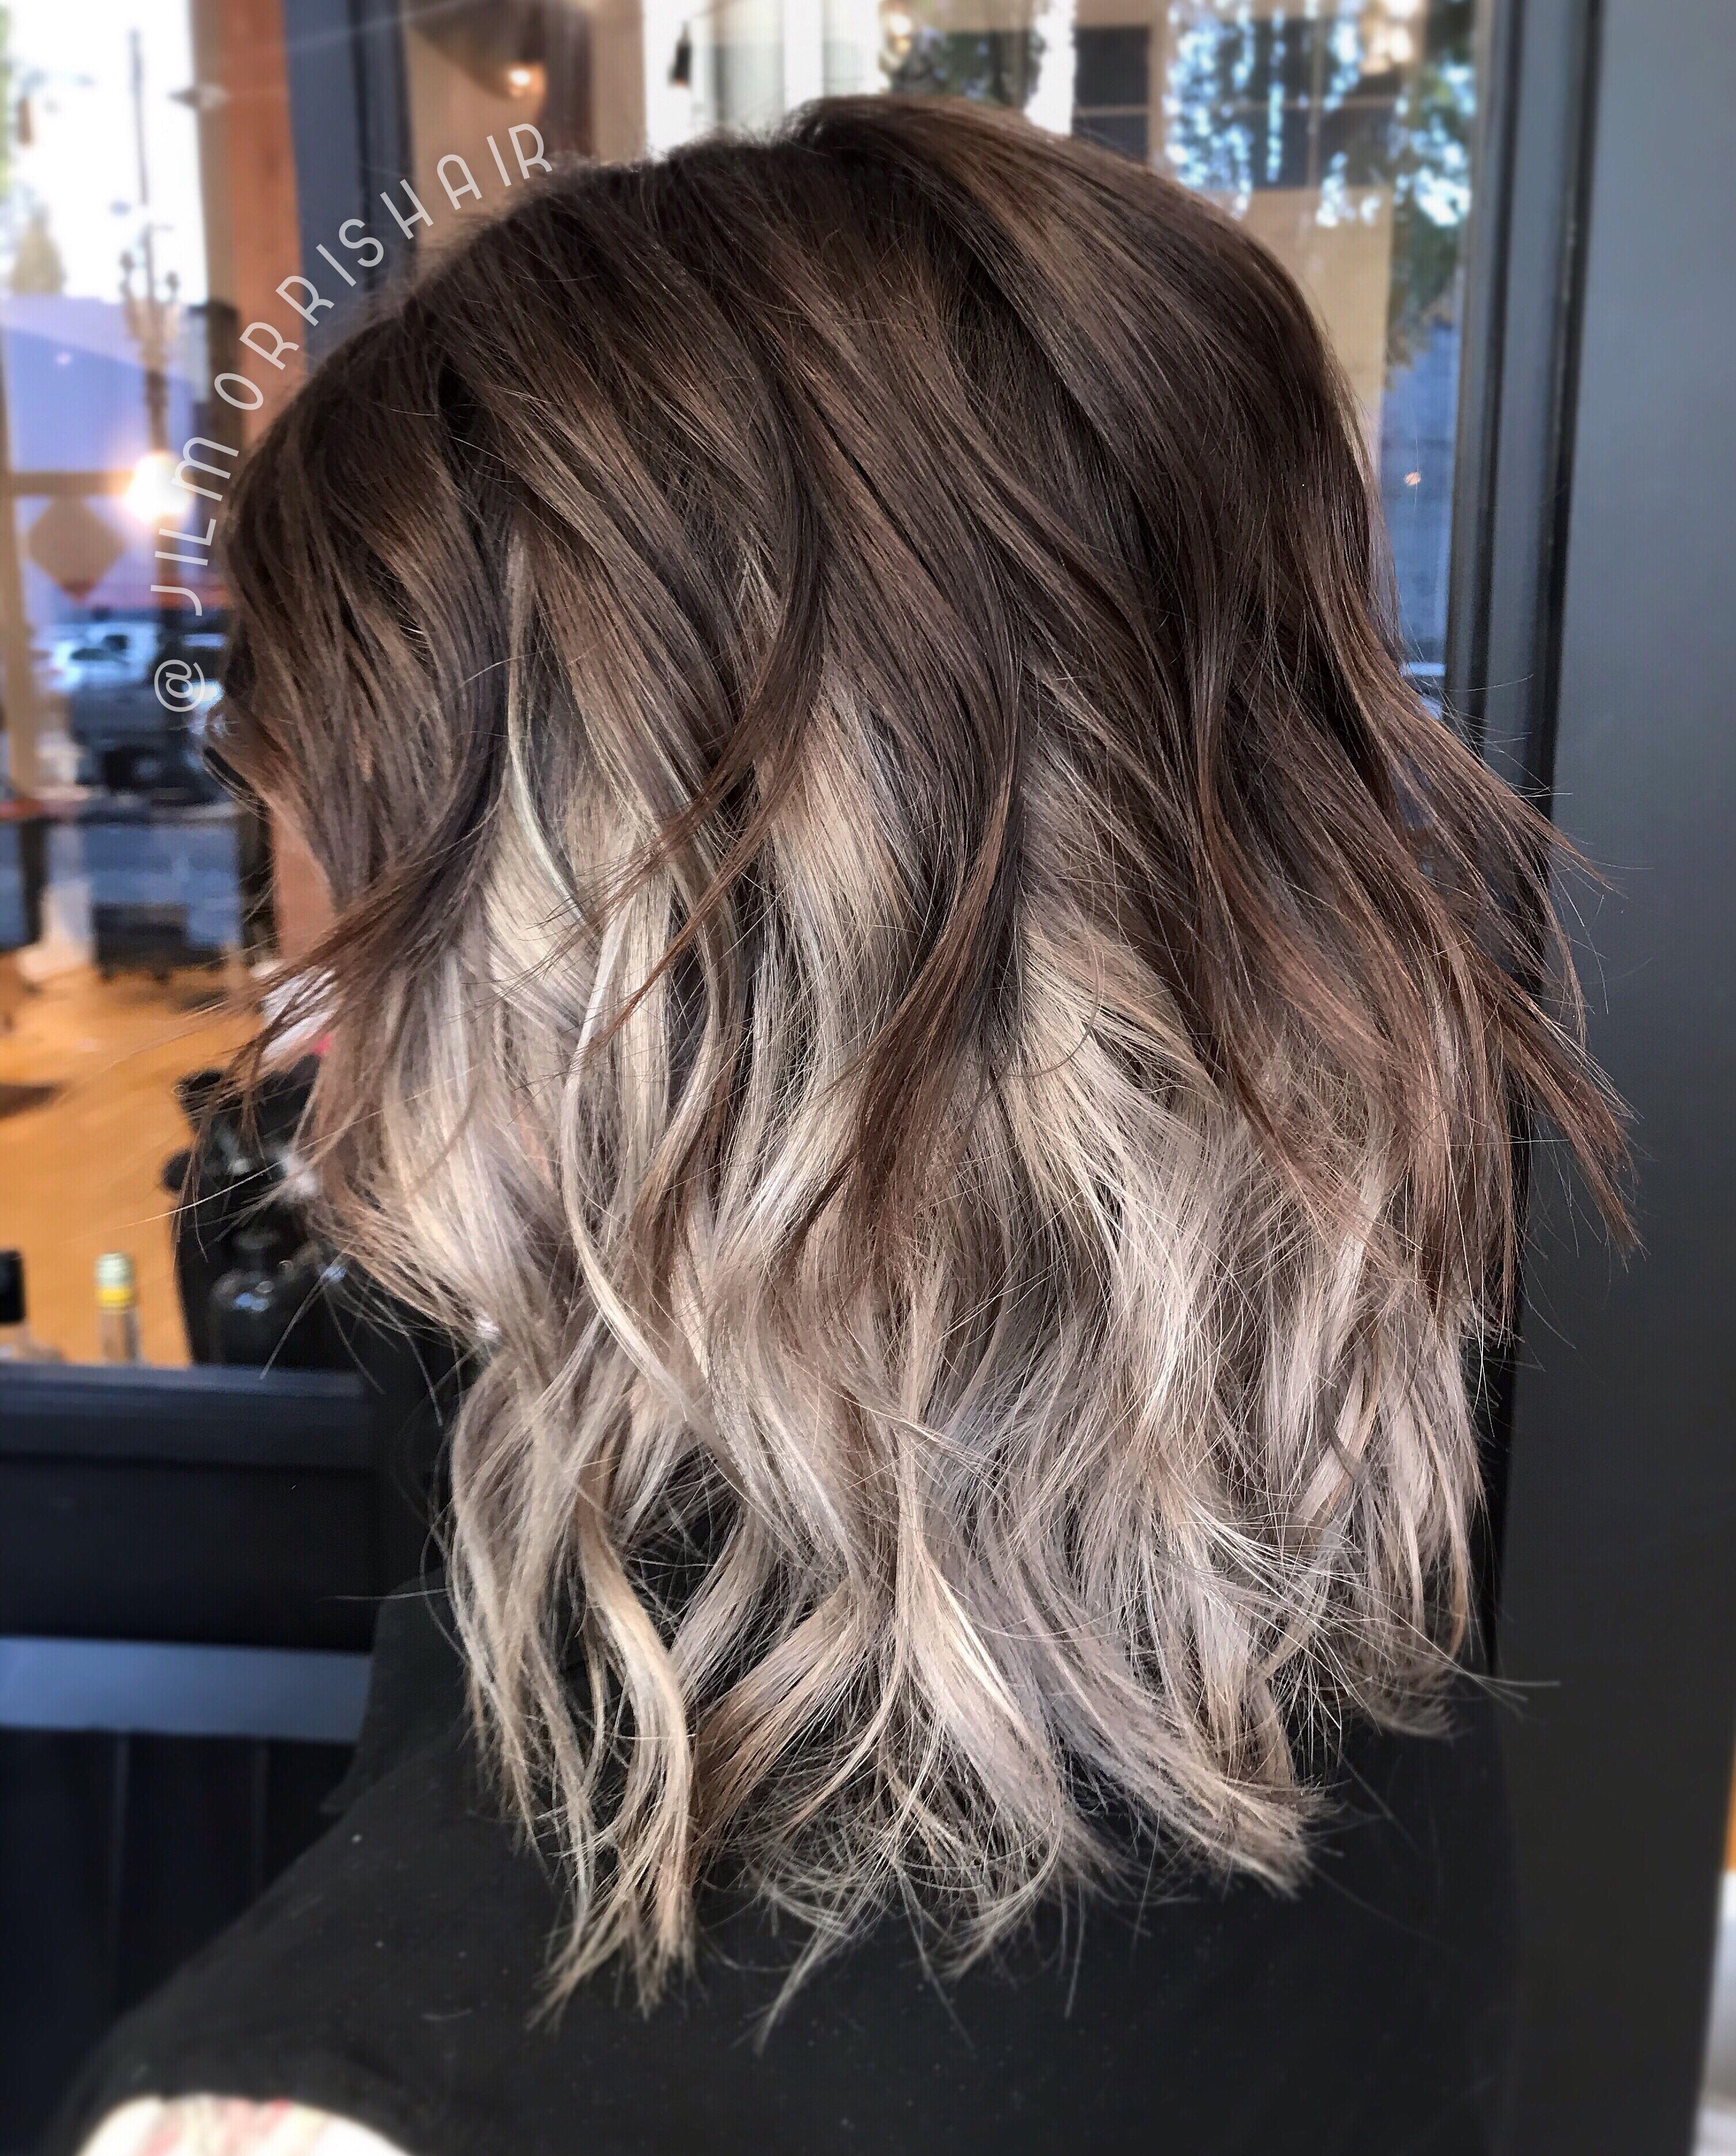 Spooky Grey Underlight Highlights Halloween Hair Warm Silver